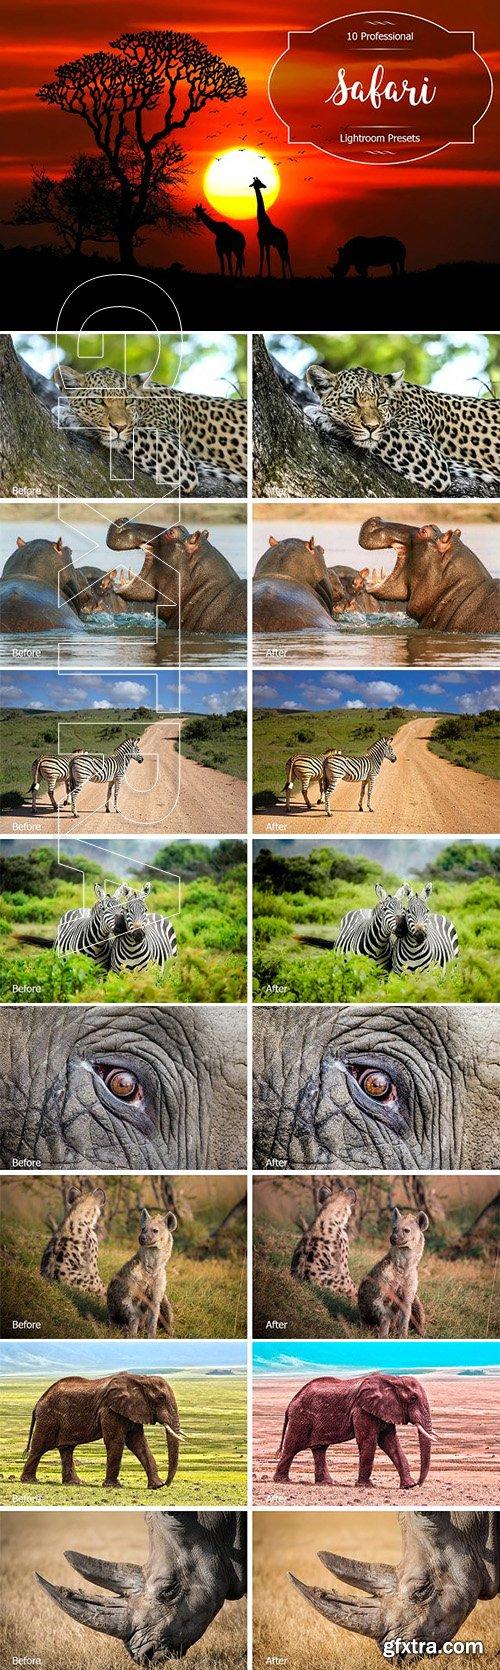 CreativeMarket - Safari Lr Presets 2952472